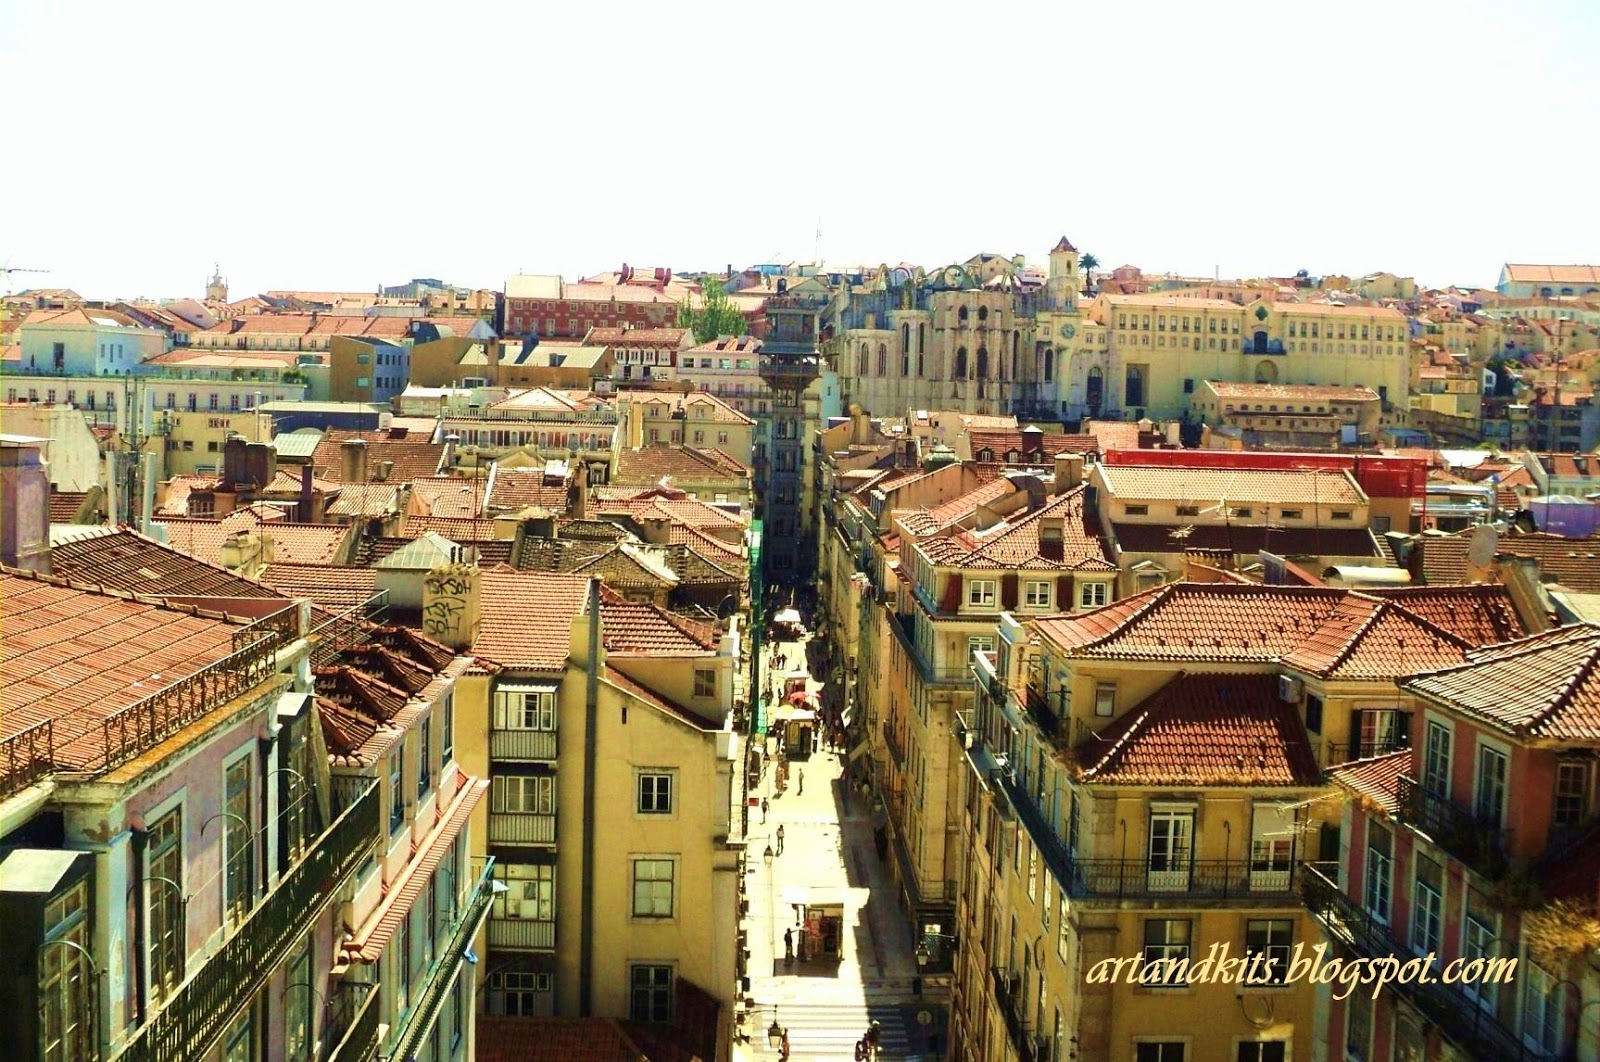 E quando o sol resolve mostrar-se... como hoje... que outra cidade no mundo consegue igualar-se, à nossa deslumbrante cidade à beira do Tejo... Lisboa? / And when the sun decides to show up... like today... what other city in the world, can be compared to our stunning city, on the edge of Tejo river... Lisbon?